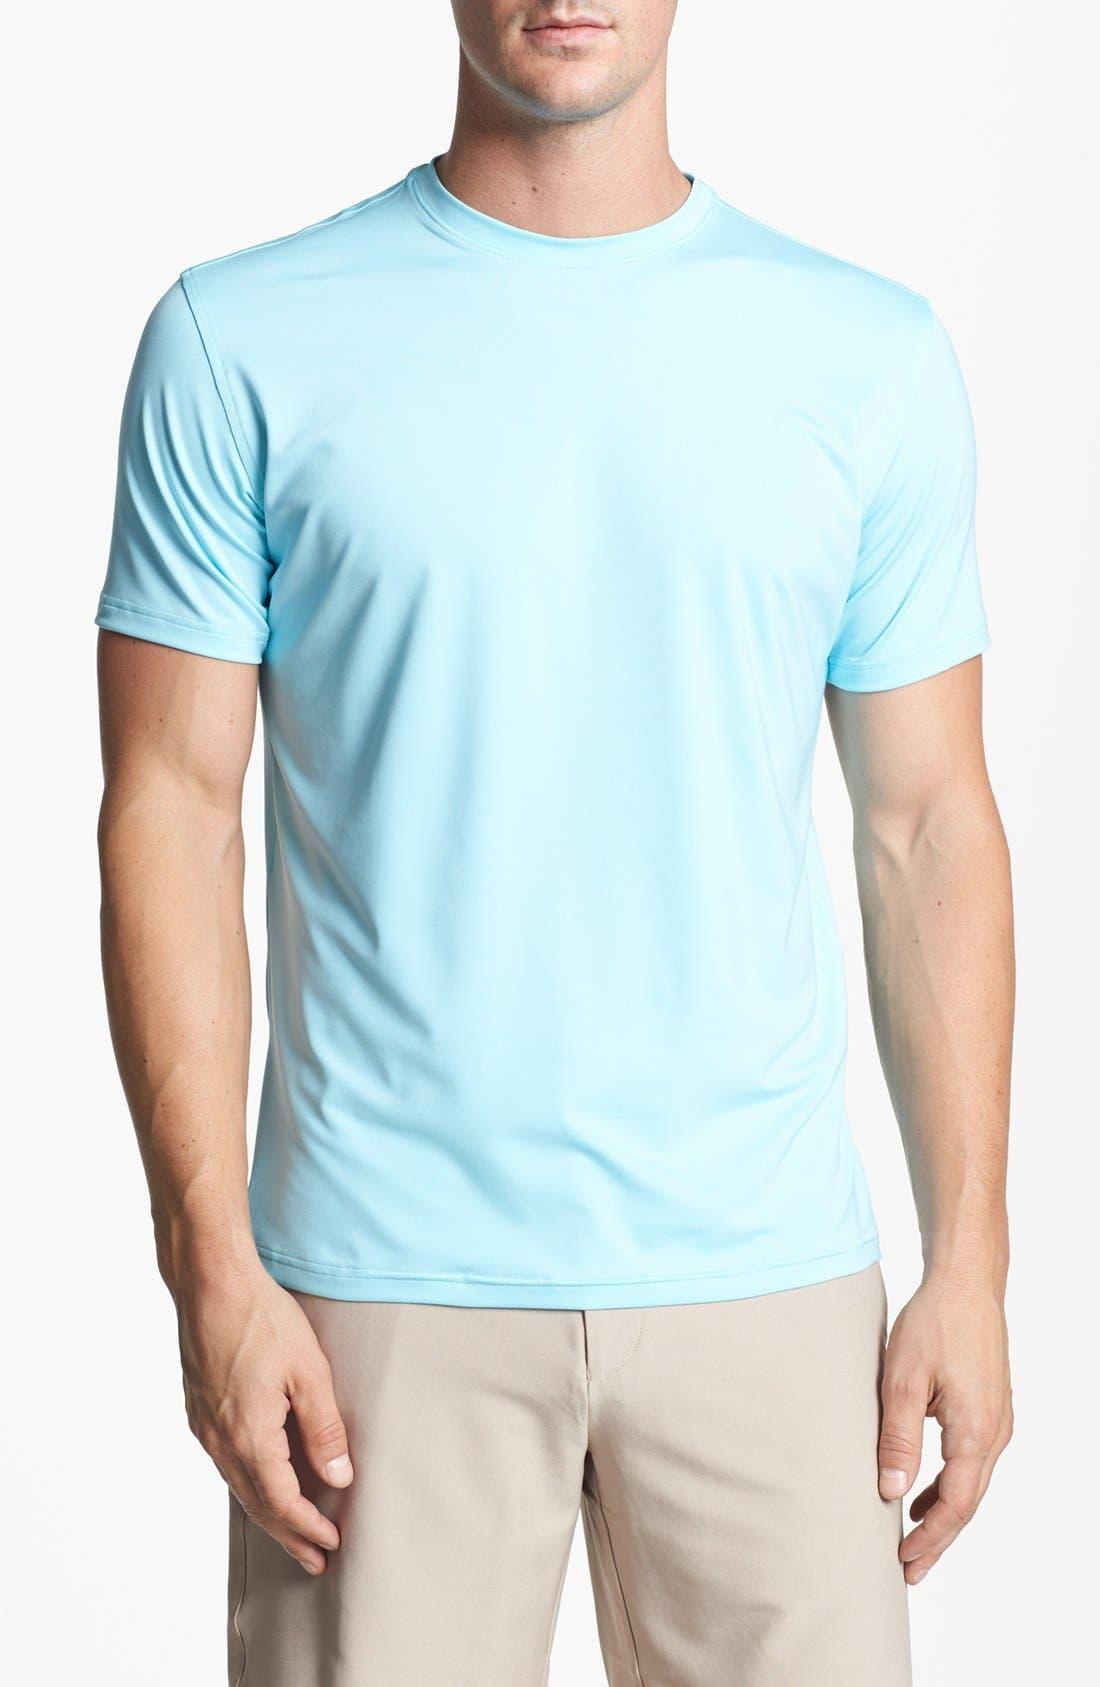 Alternate Image 1 Selected - Peter Millar 'Limerick' Stretch T-Shirt